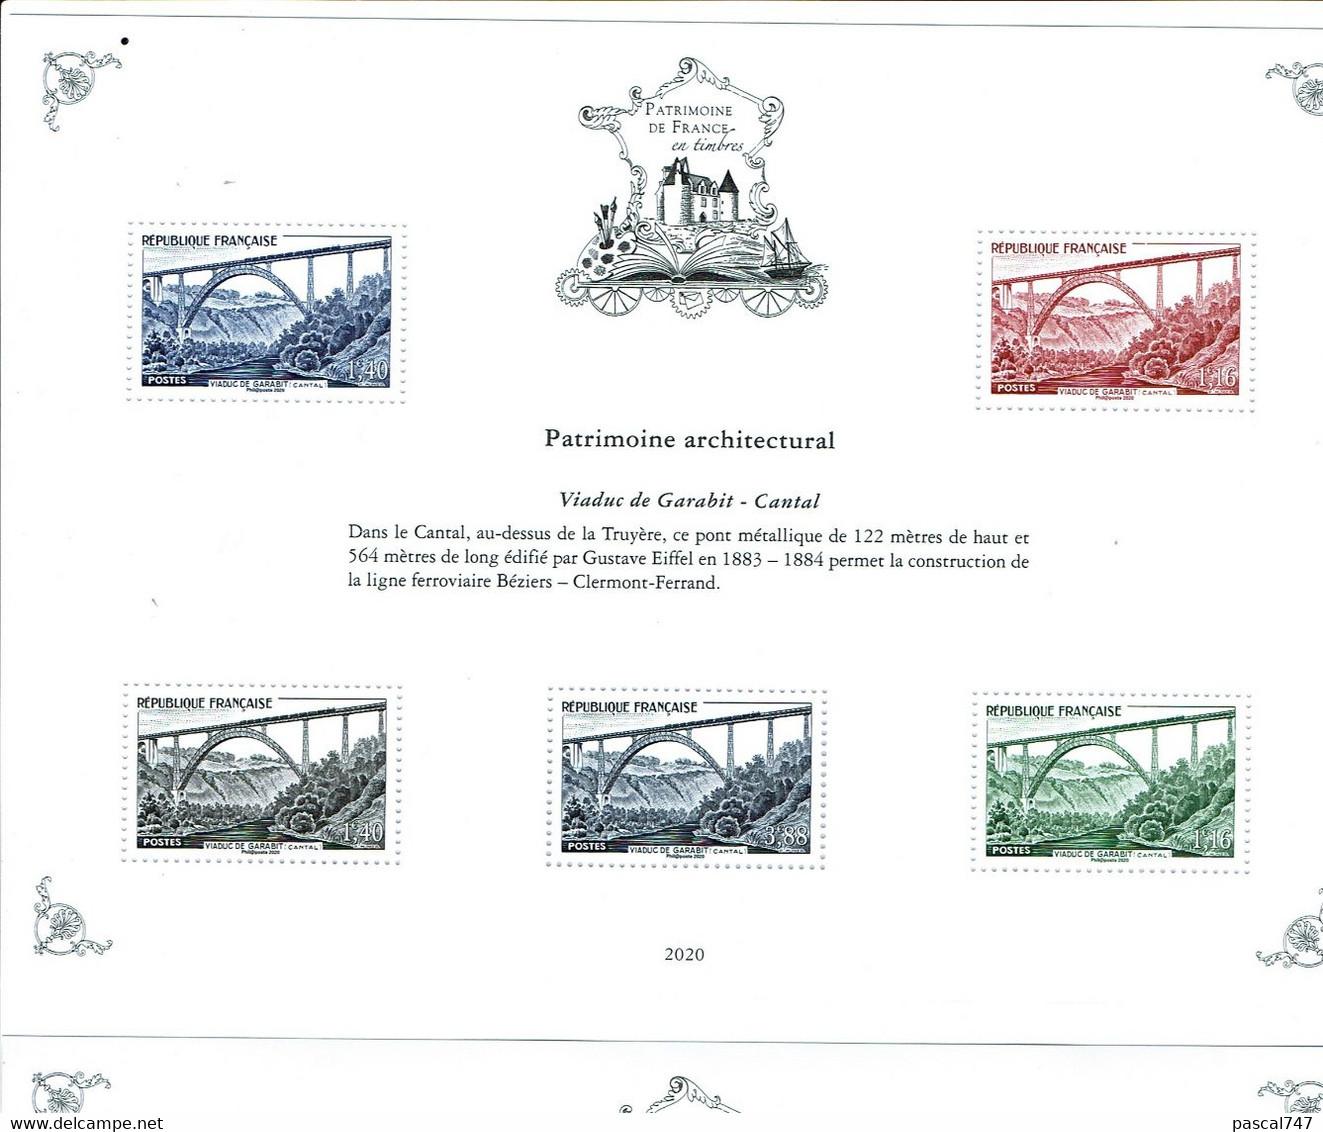 Patrimoine De France Timbres 2020 Bloc Viaduc Garabit Cantal - Ongebruikt